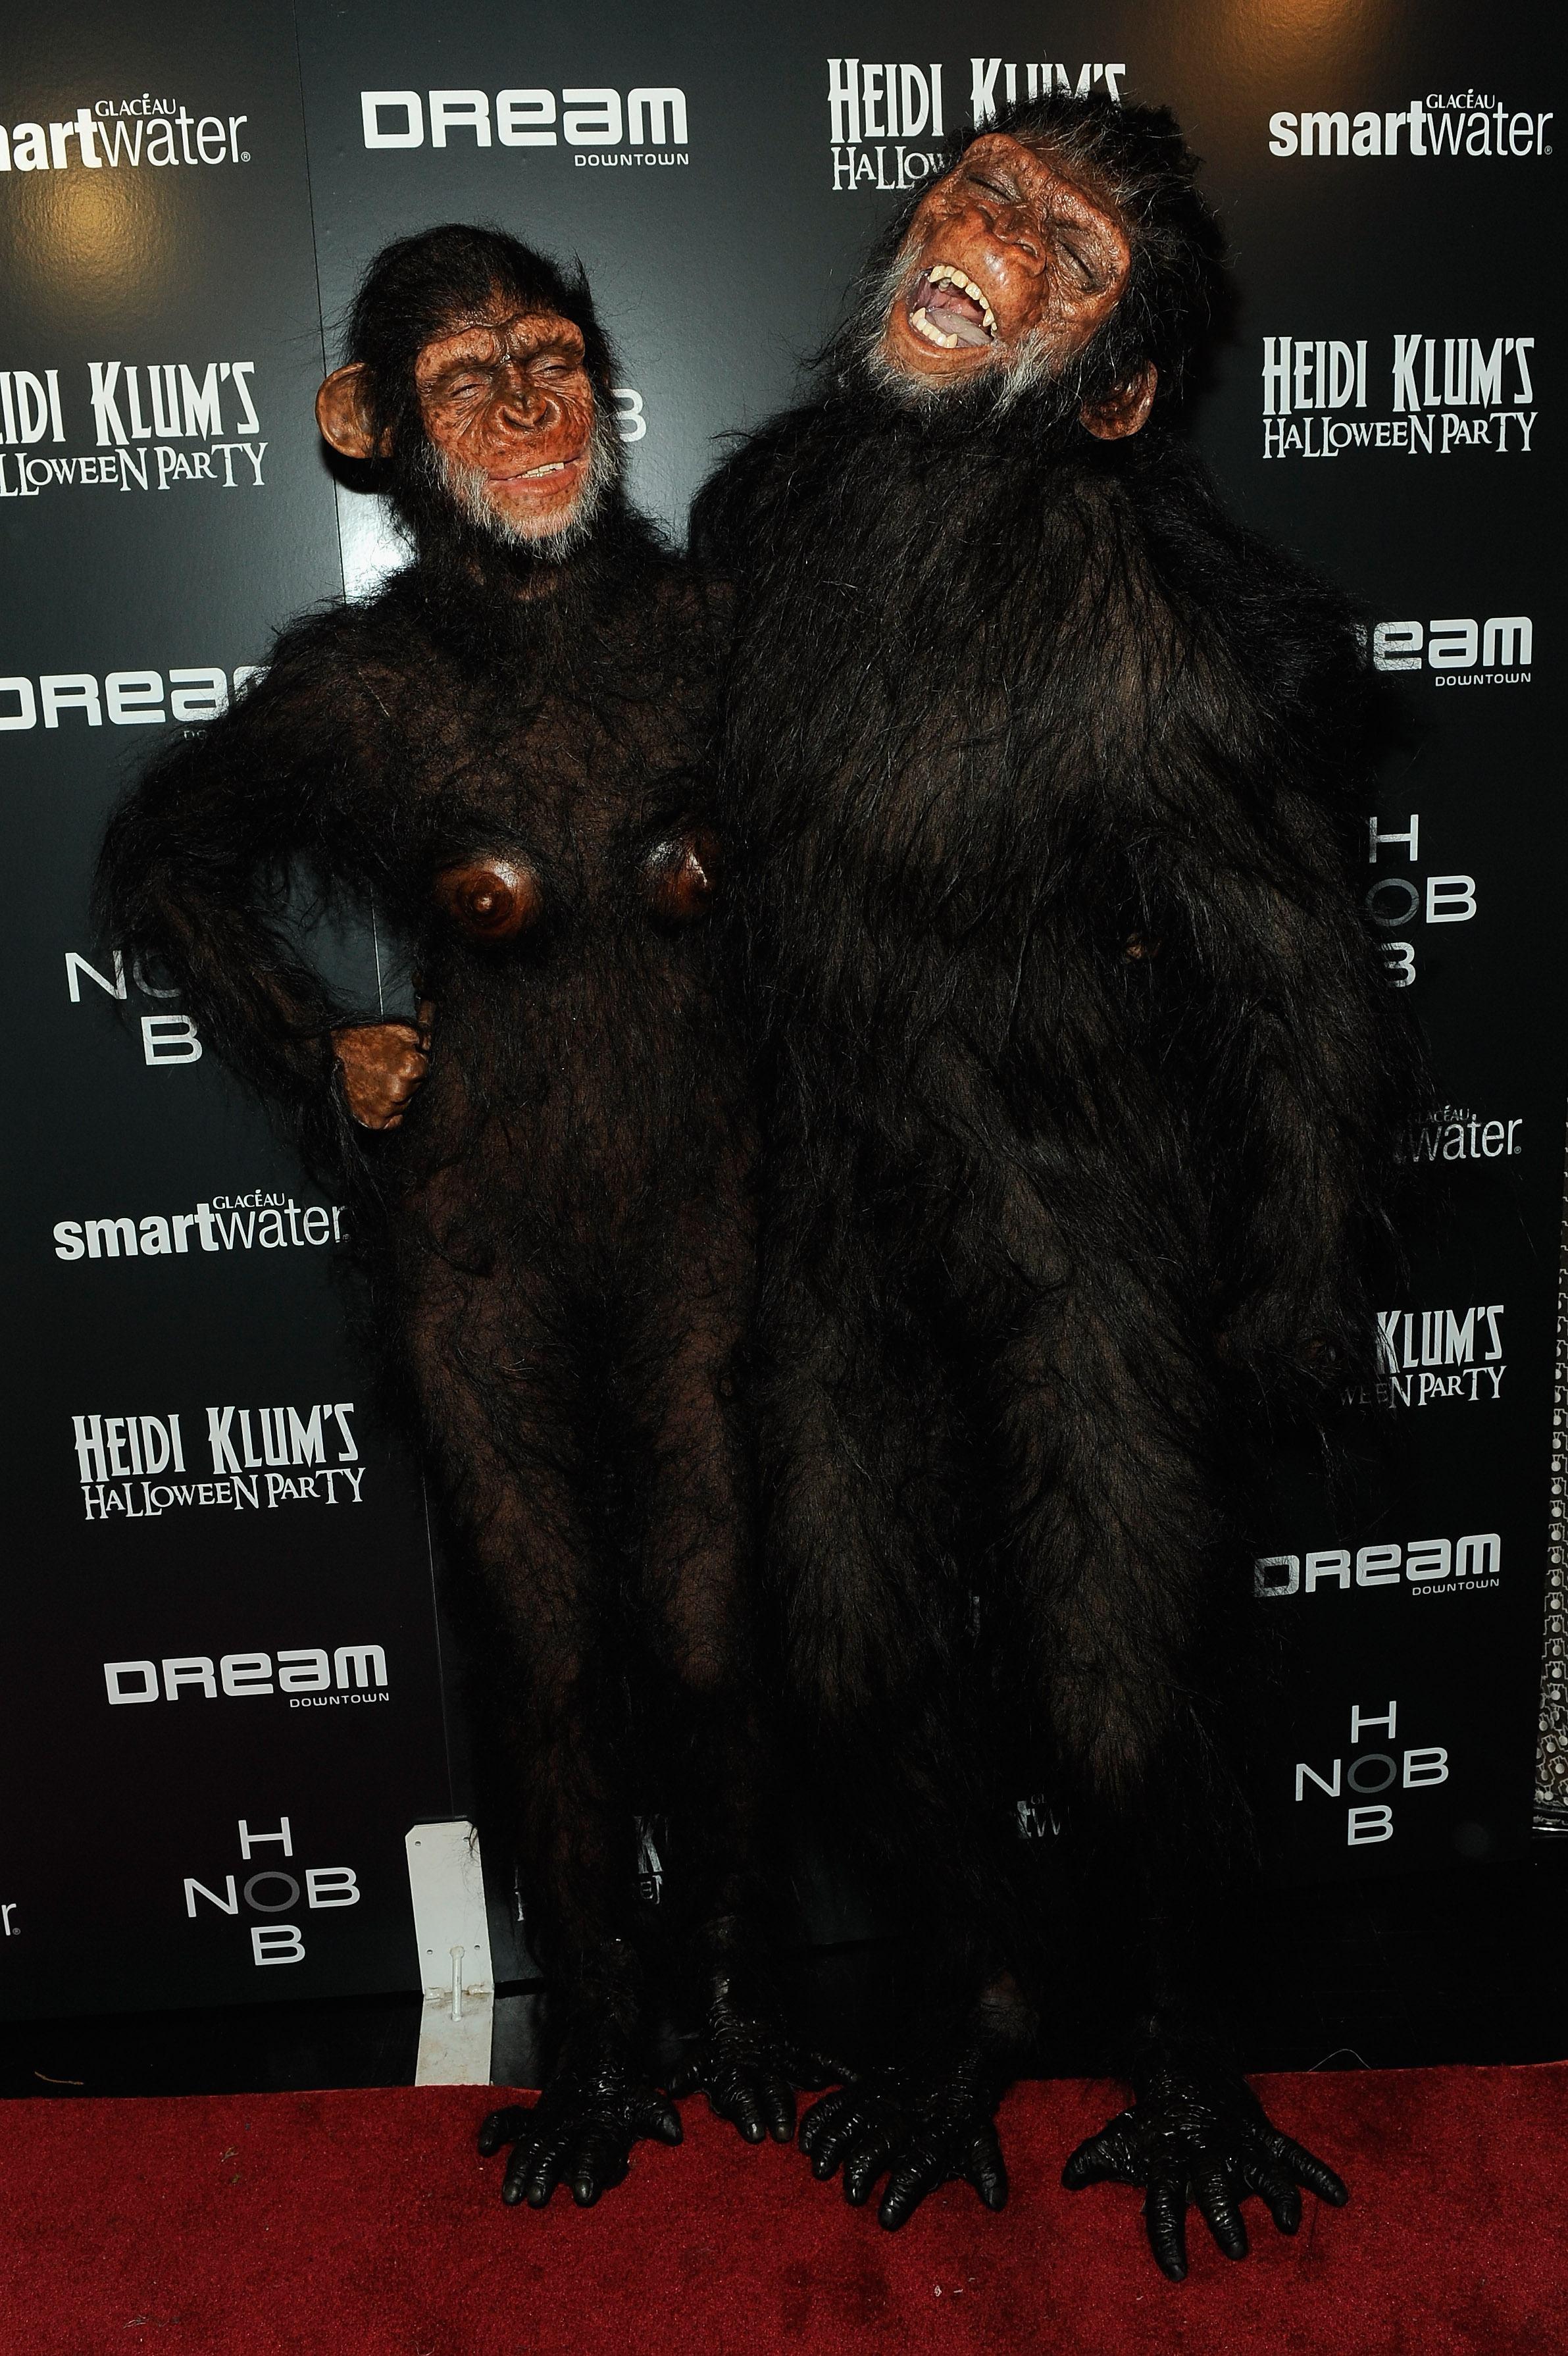 Heidi Klum Ape halloween